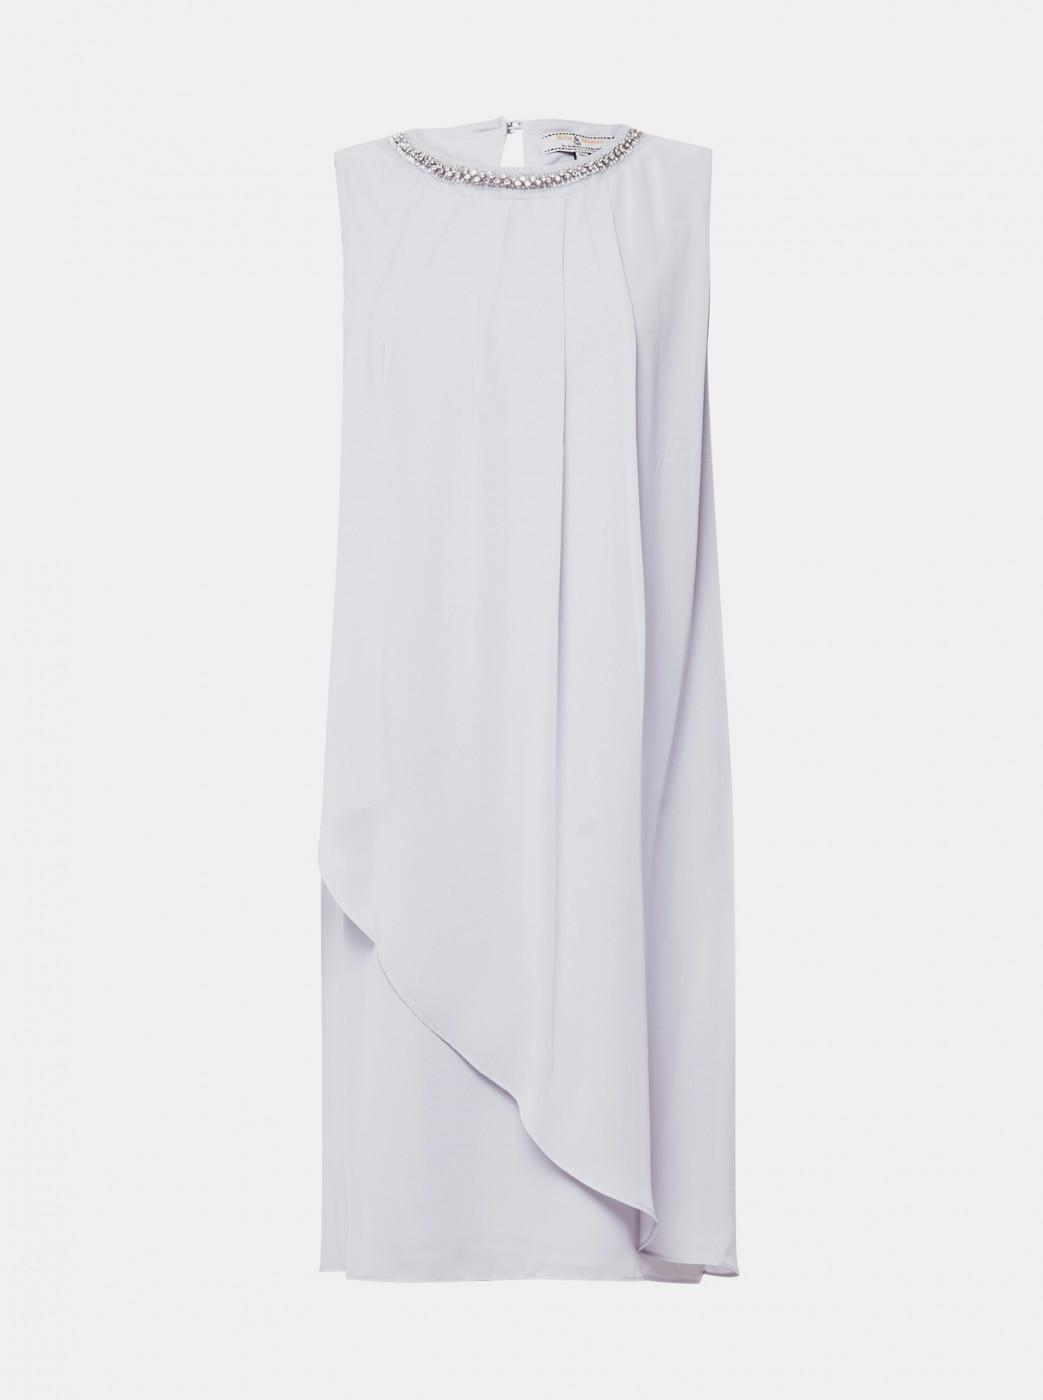 Light Grey Billie & Blossom Dress